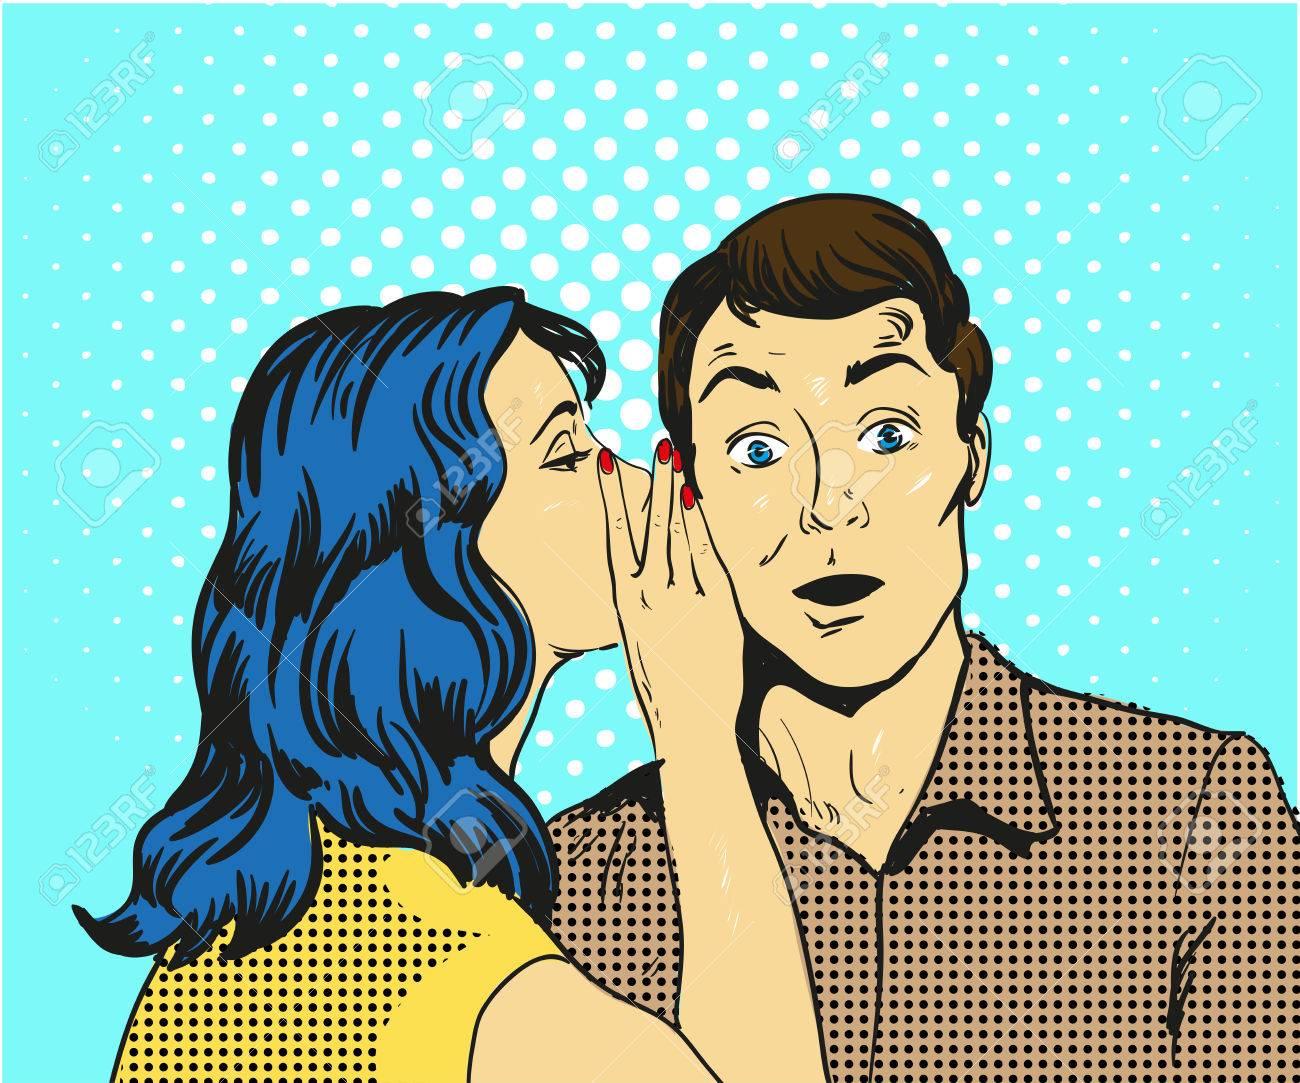 Man and woman whisper pop art vector illustration - 76173738